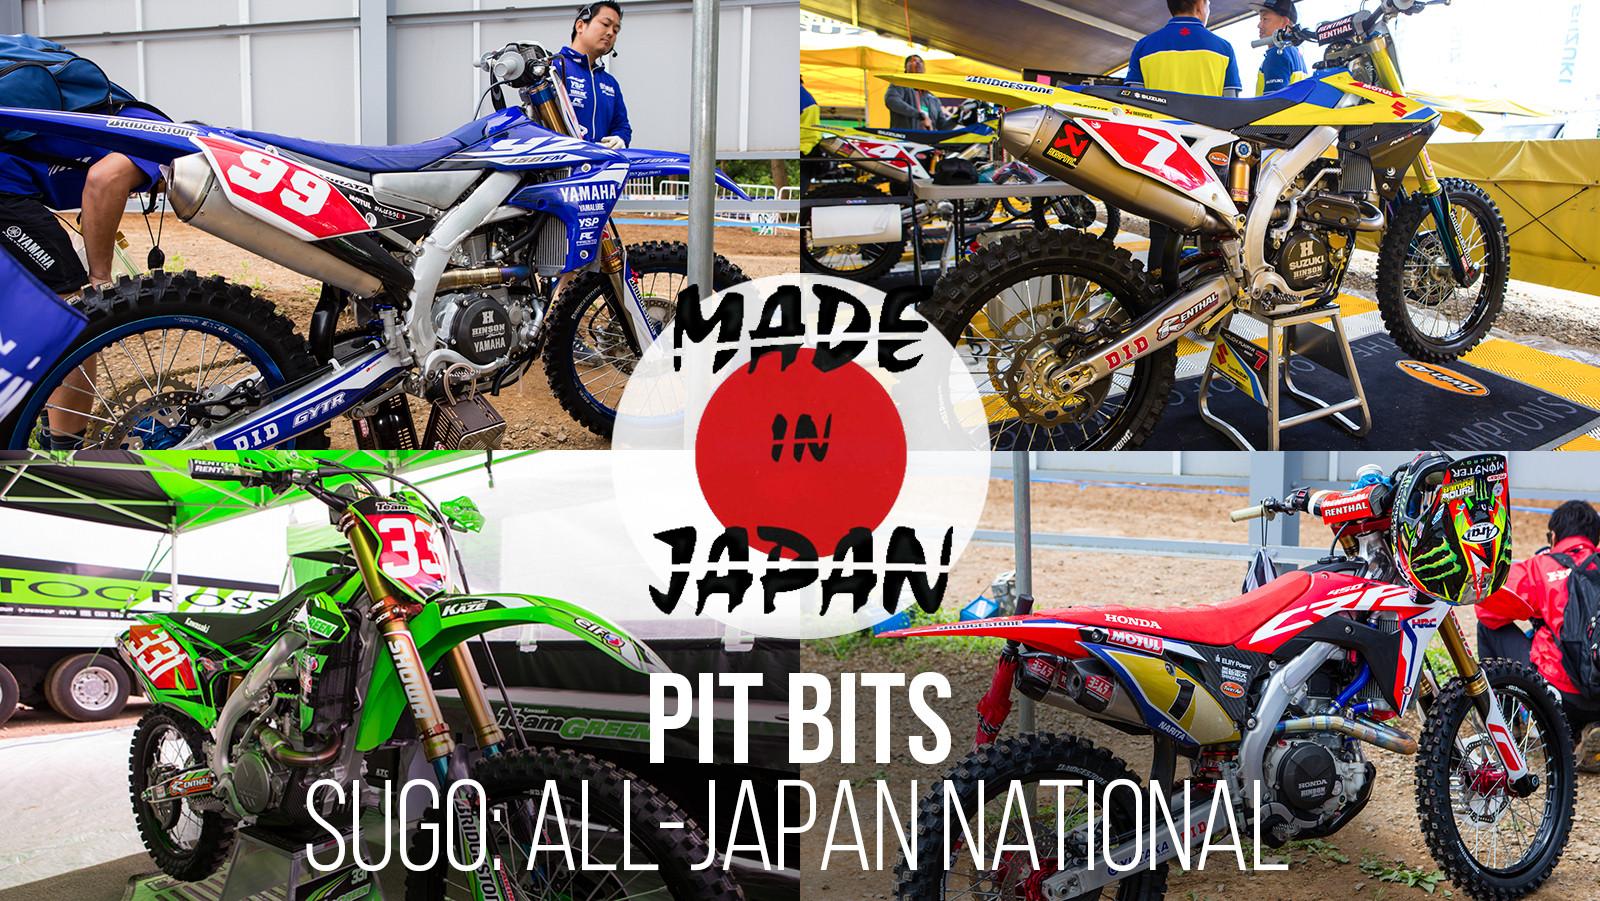 Vital MX Pit Bits: All-Japan Nationals - Sugo 2017 - Vital MX Pit Bits: 2017 Sugo All-Japan National - Motocross Pictures - Vital MX